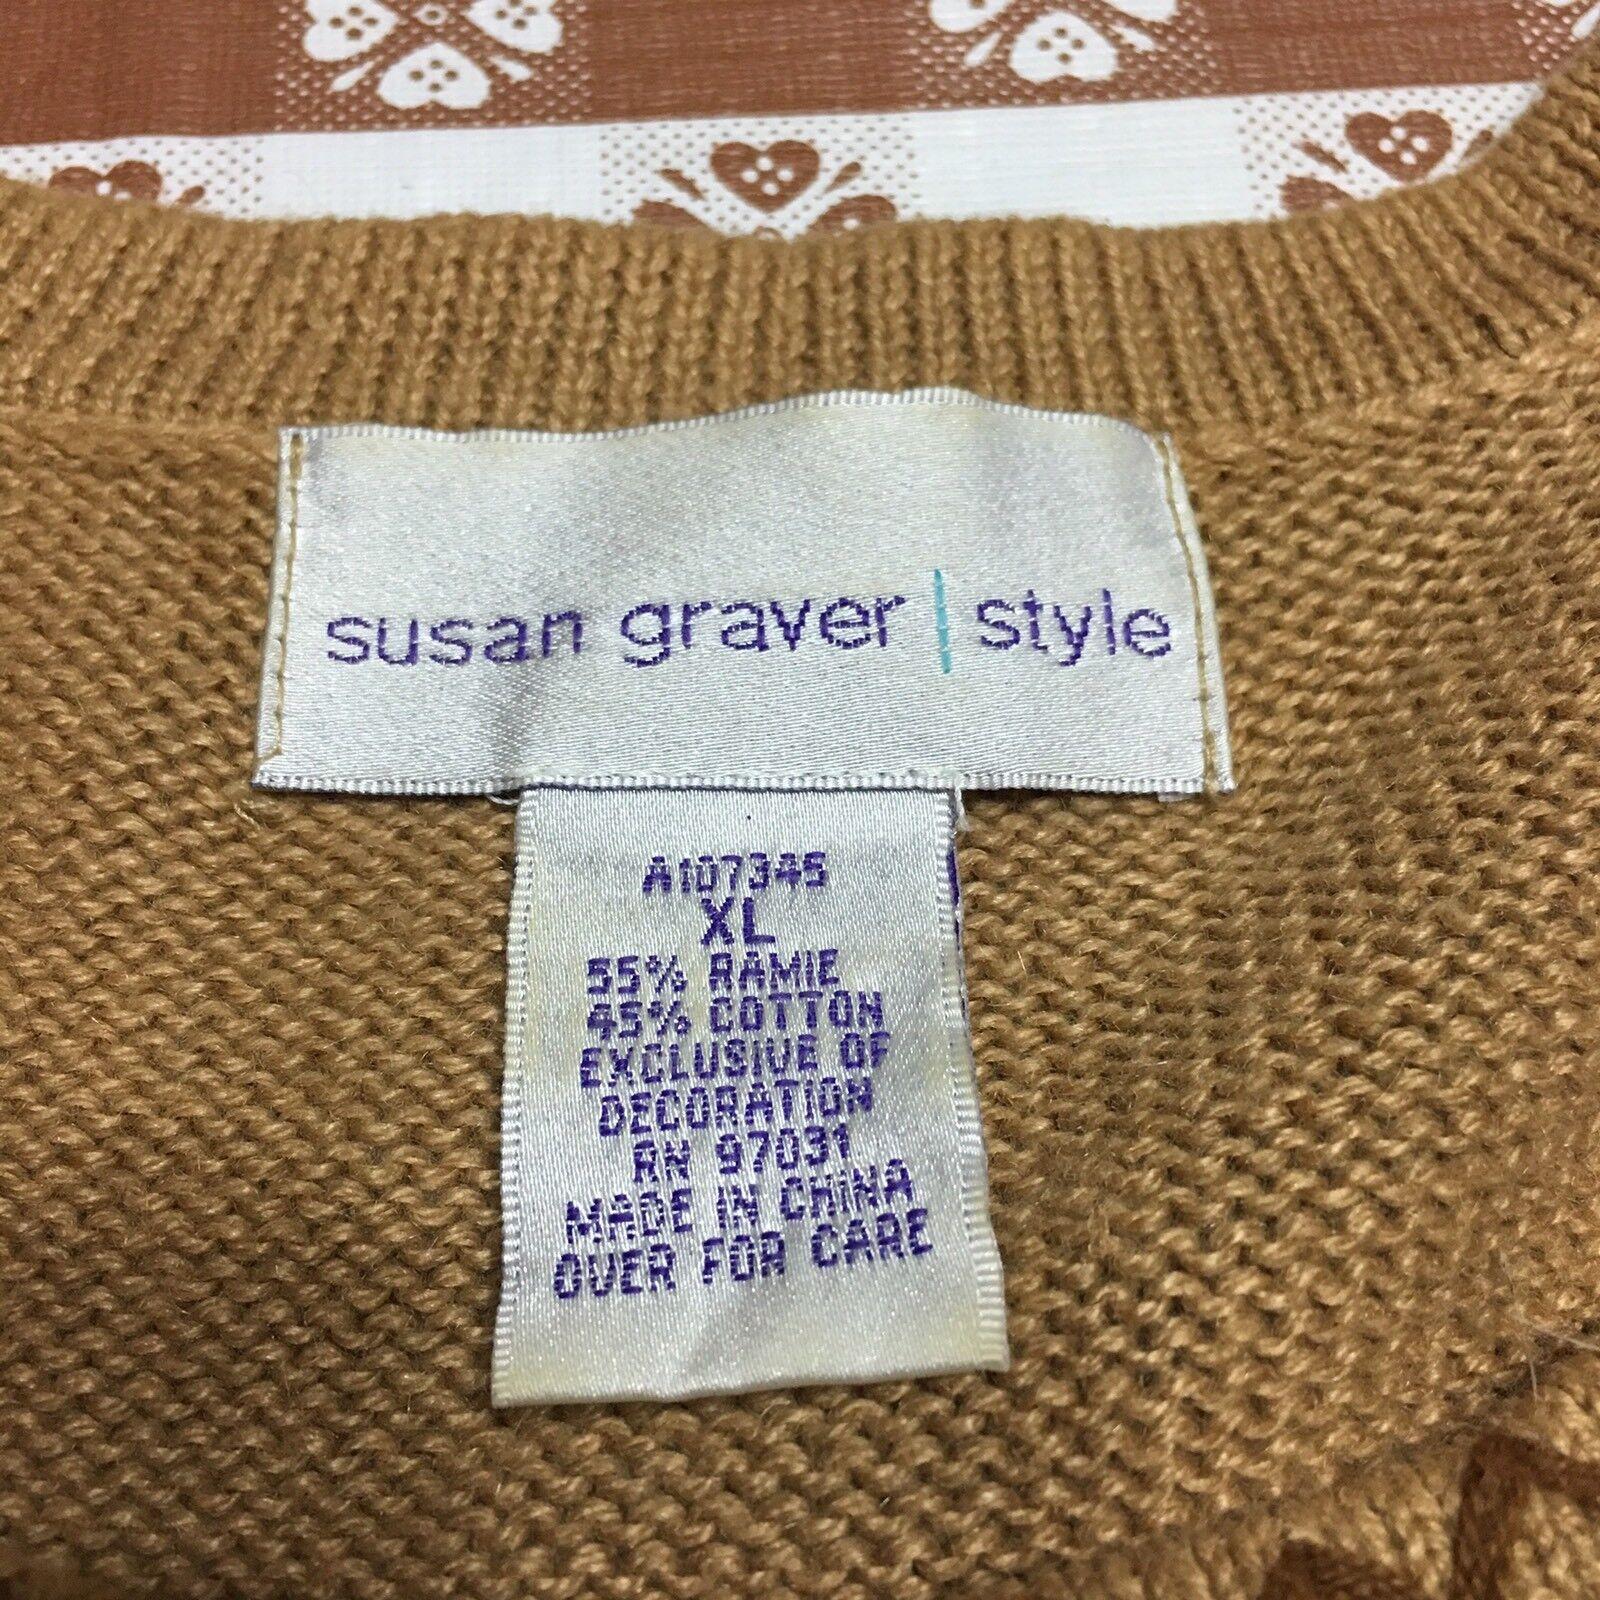 Susan Susan Susan Graver Sweaters XL Ramie Cotton Embroidered Palm Trees Beads Christmas 6d94d8